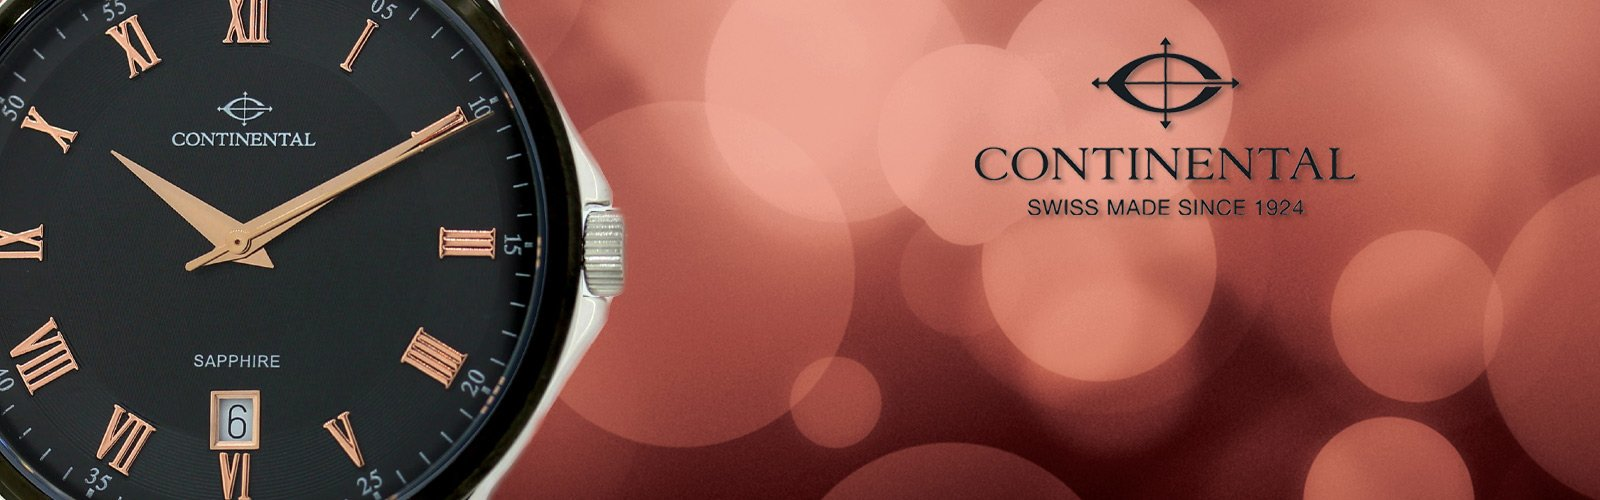 Наручные часы Continental (Континенталь)